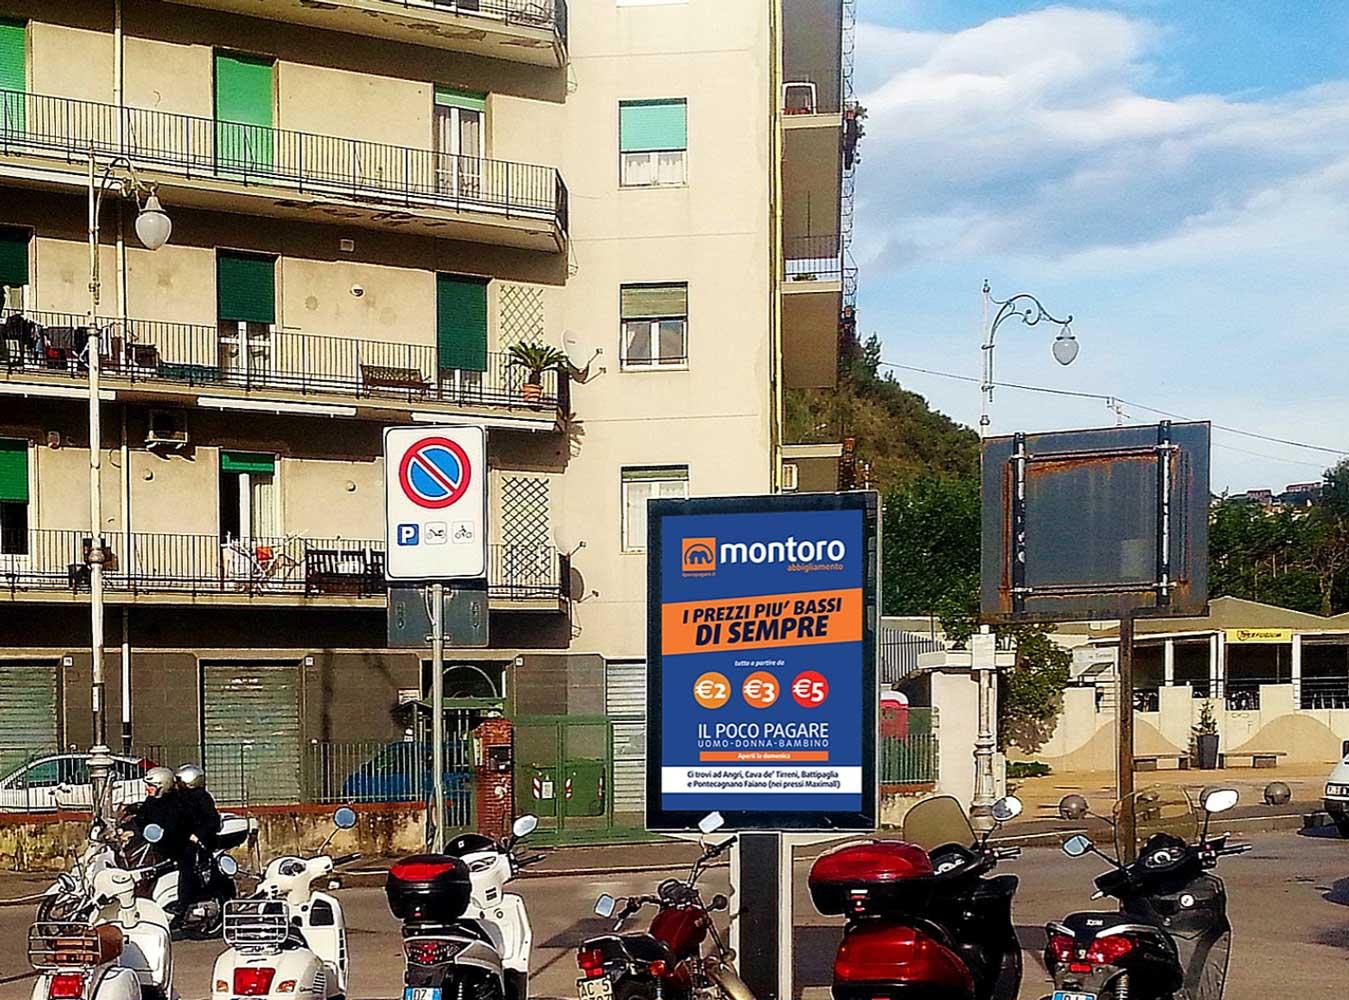 21. Via Carella (Torrione)